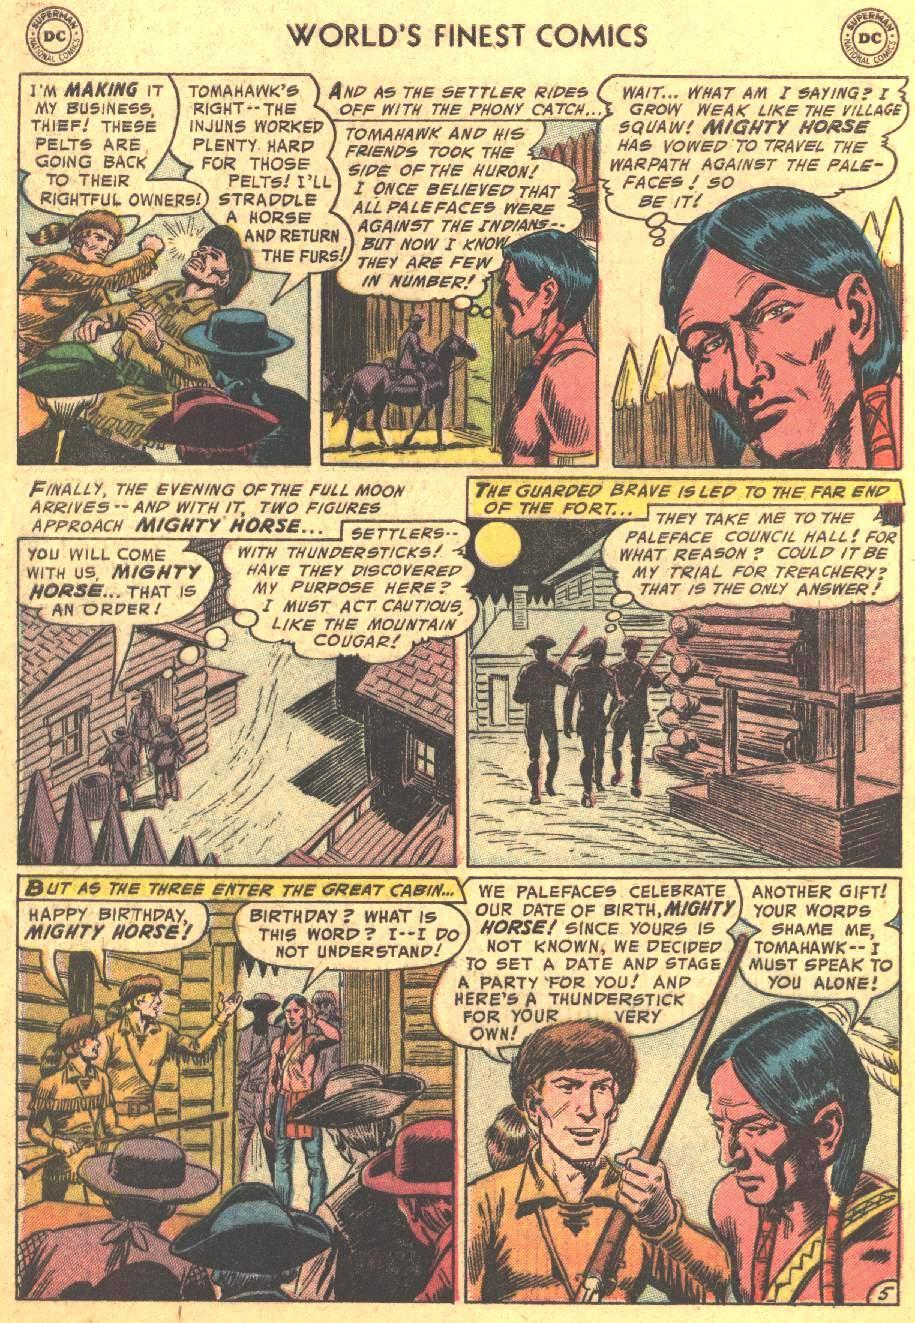 Read online World's Finest Comics comic -  Issue #80 - 32